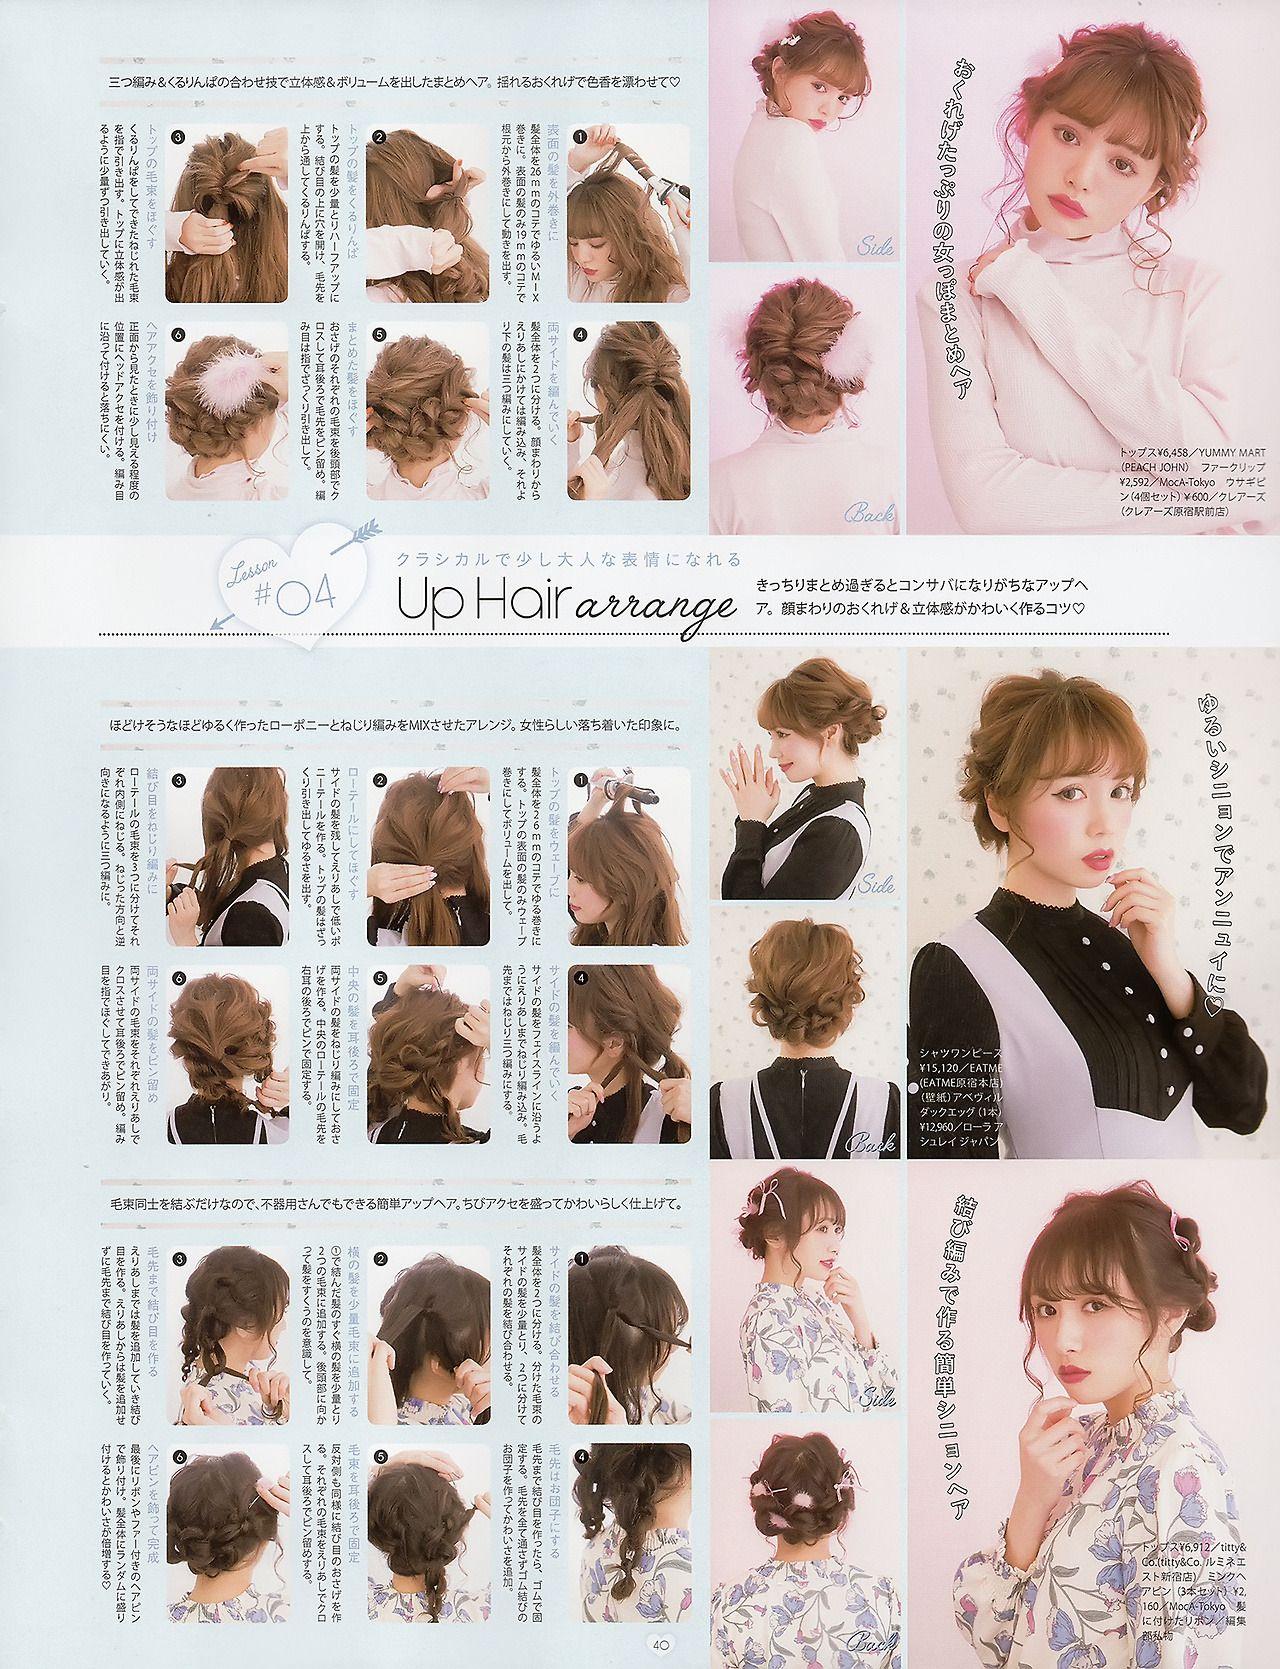 Pin By Ashley Castillo Juuzou My Sen On Hair Ideas Kawaii Hairstyles Japanese Hairstyle Hair Styles